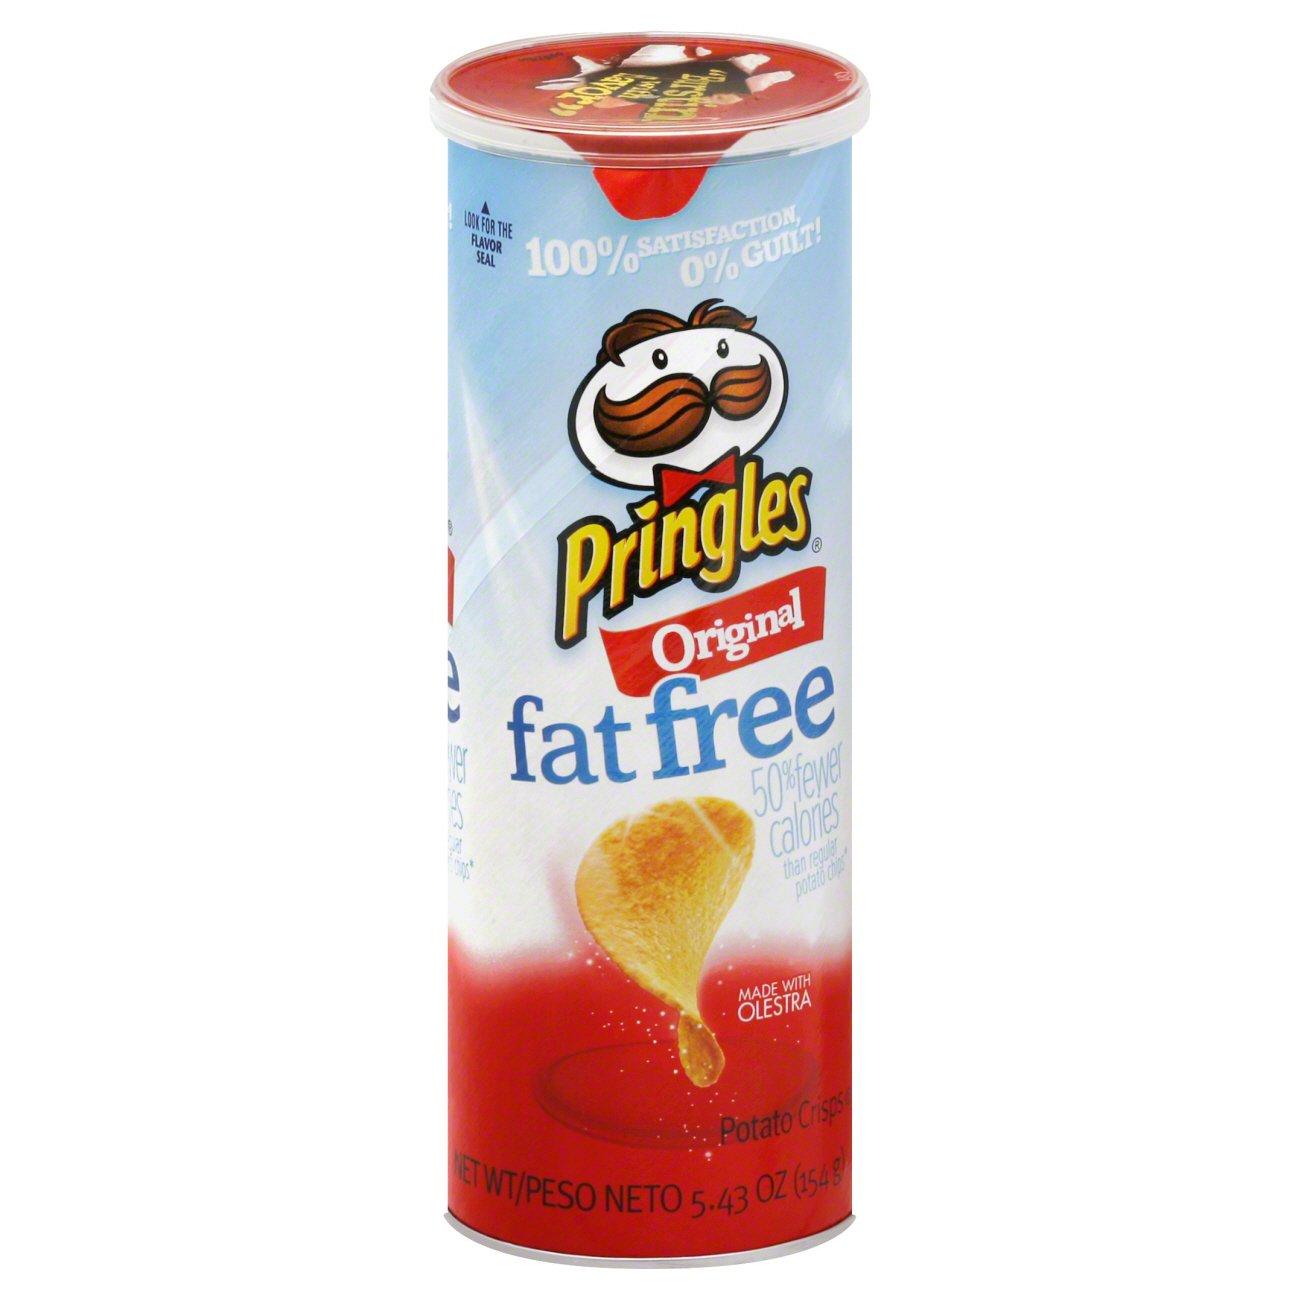 Fat Free Original Potato Crisps